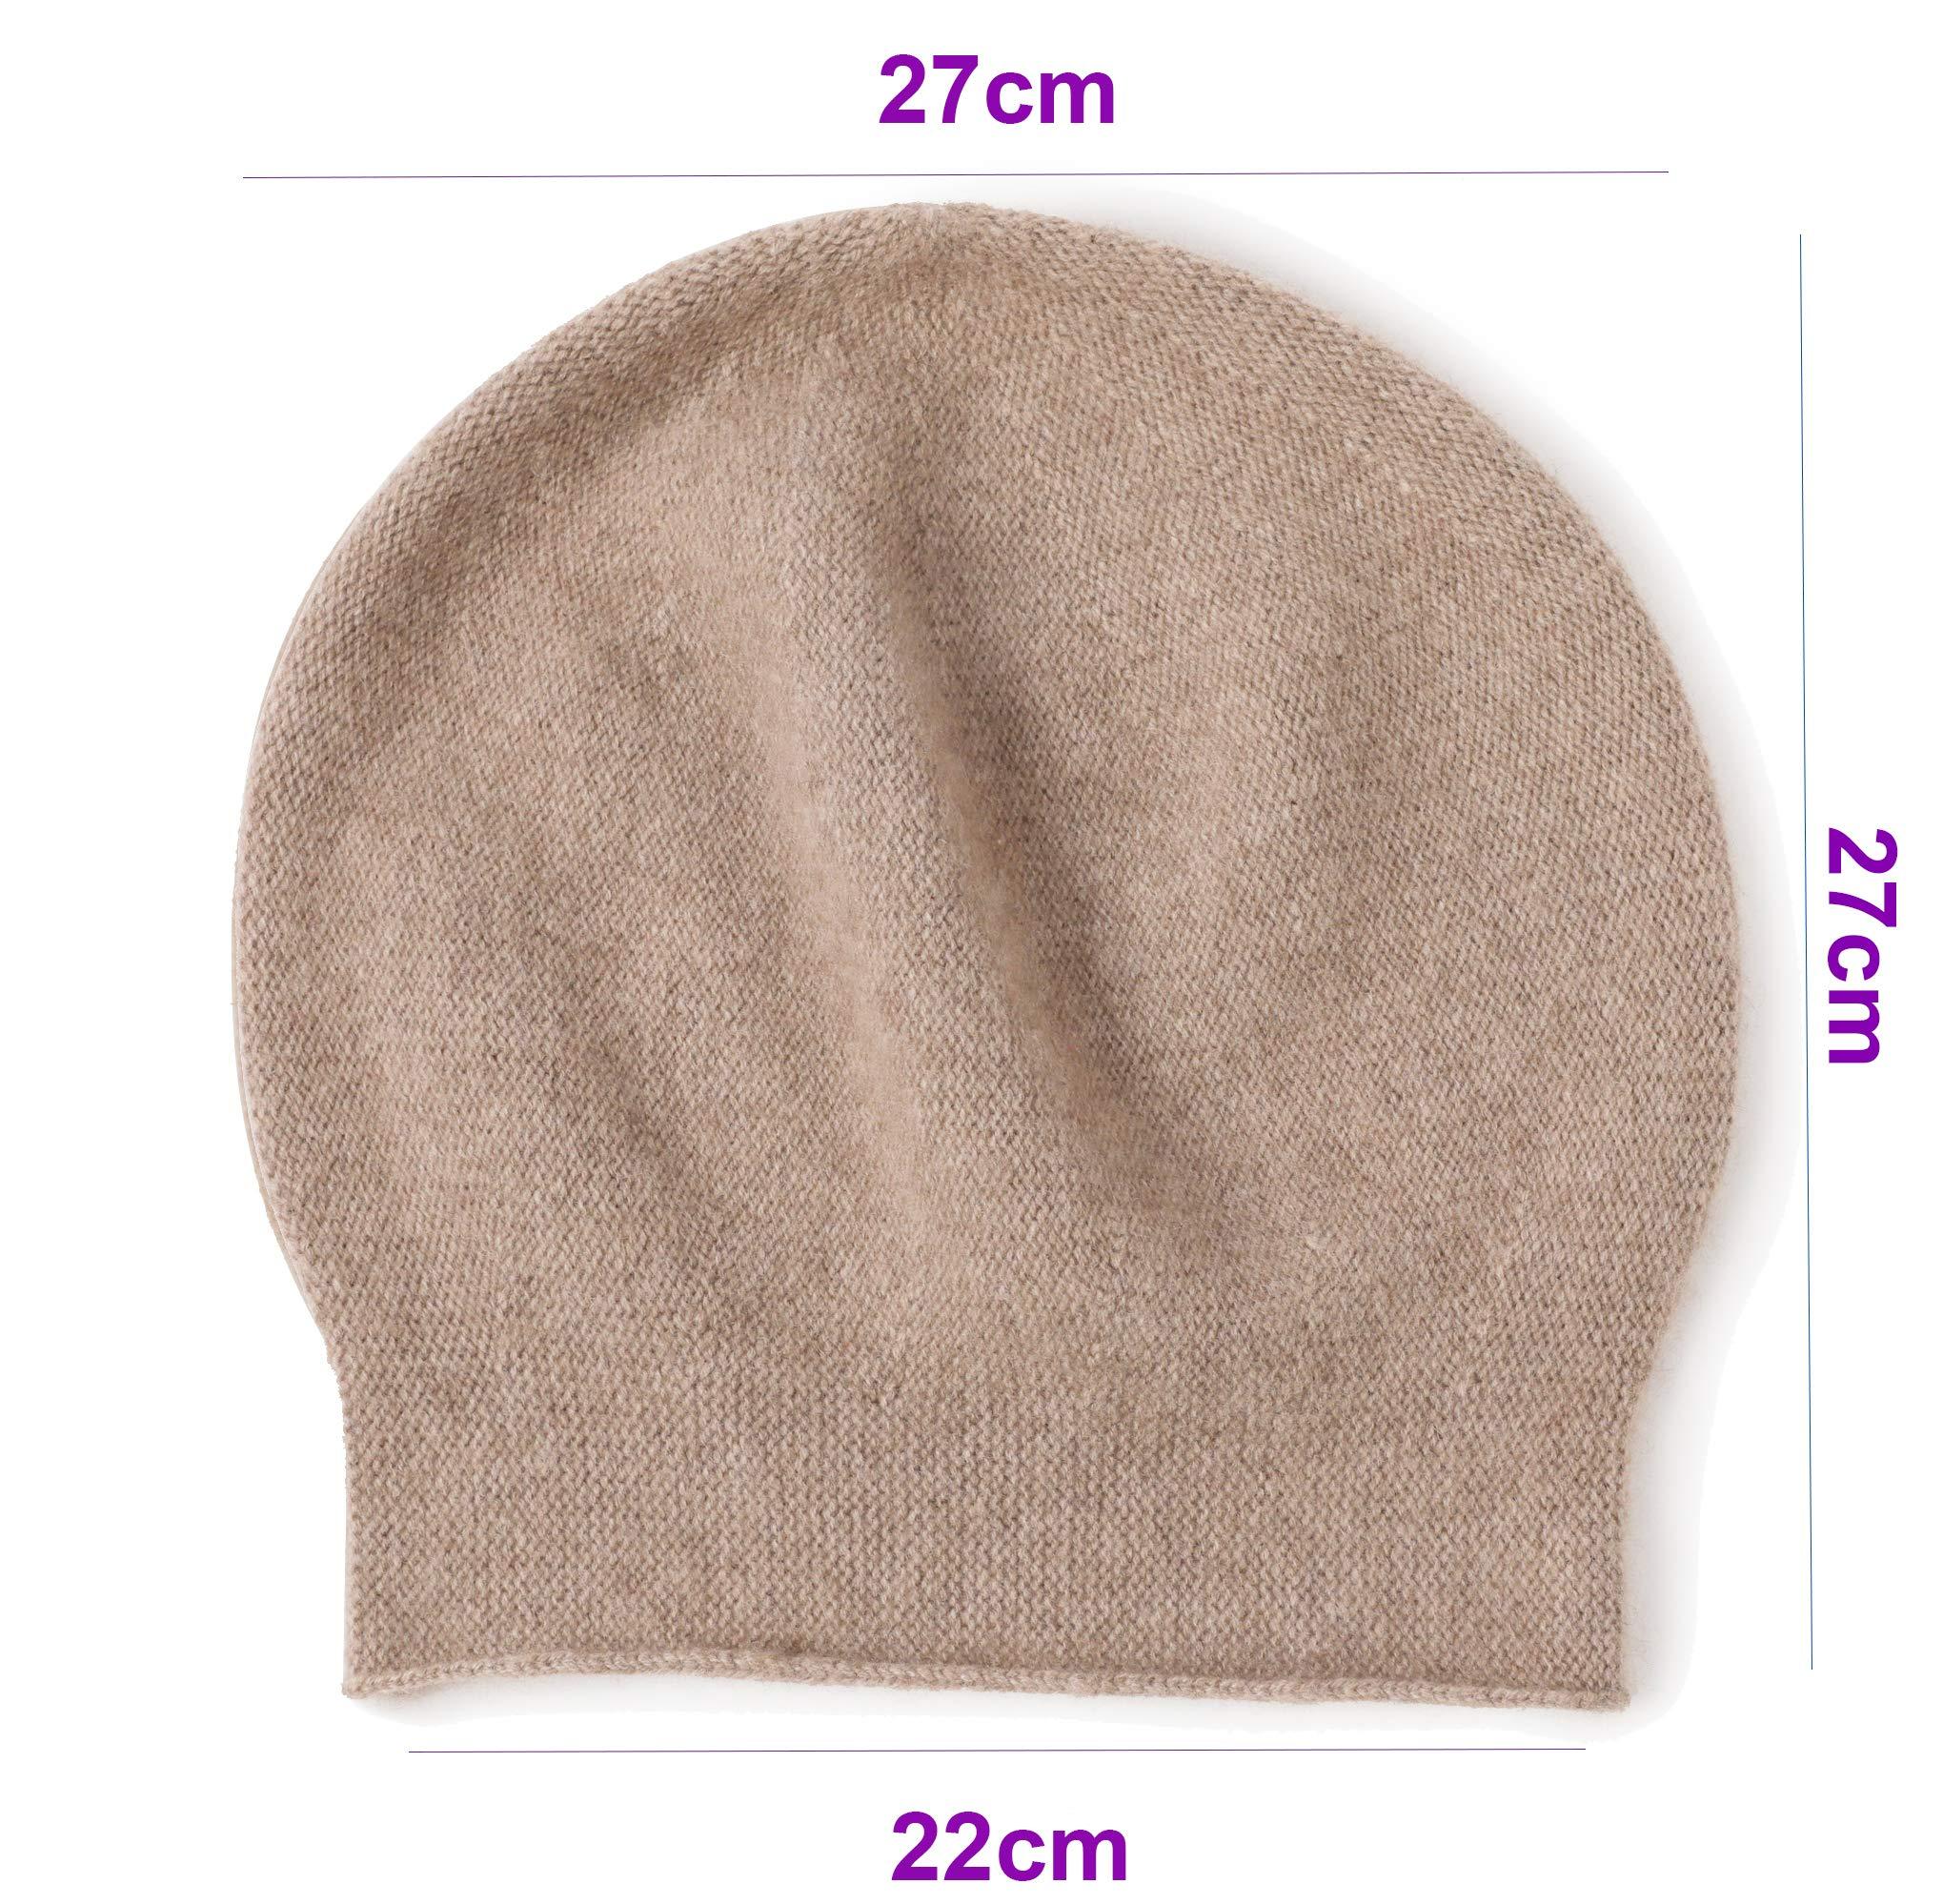 Ellettee 100% Pure Cashmere Slouchy Beanie Womens Knit Caps Khaki